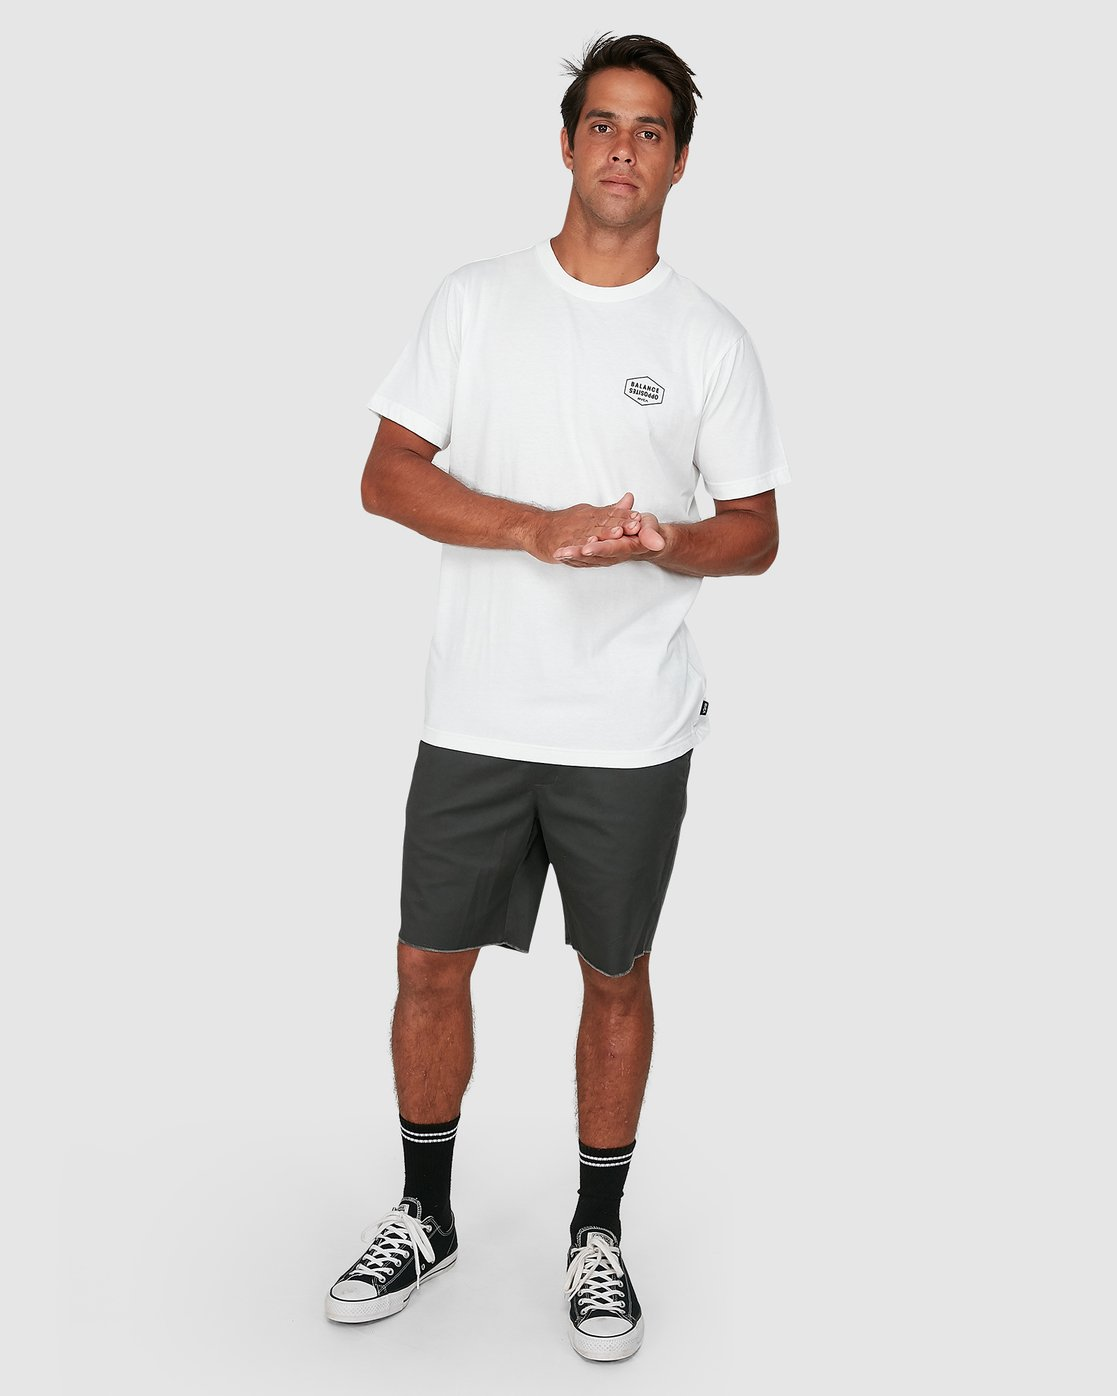 5 Rvca Hex Short Sleeve Tee White R106058 RVCA